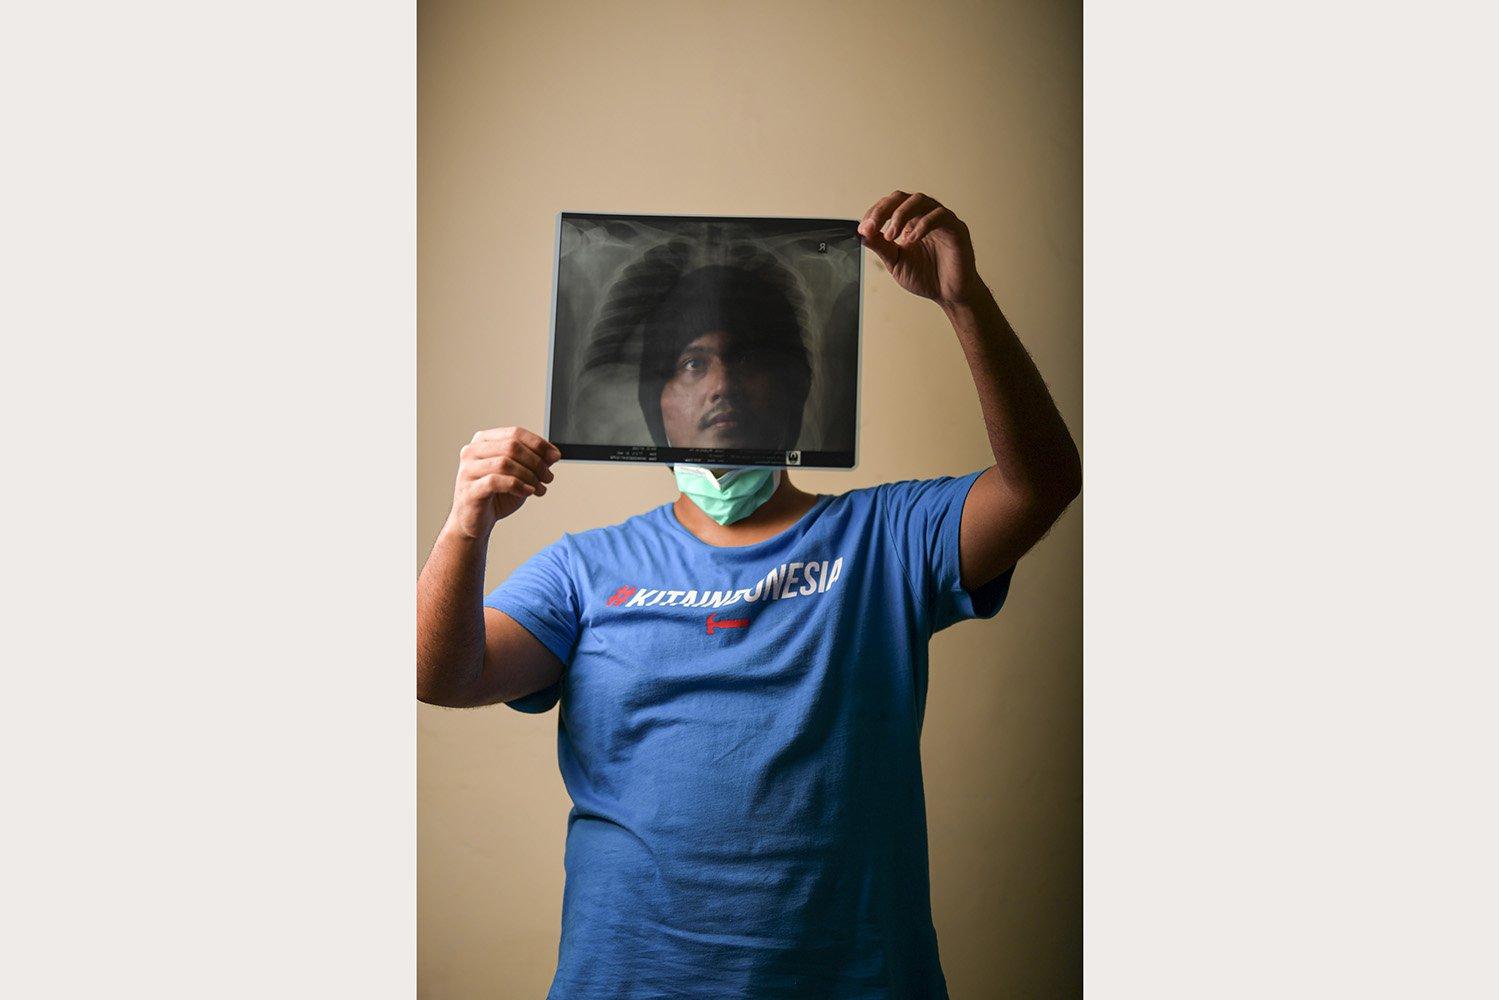 Rilsan Malkhi (26) menunjukkan hasil rontgen paru-paru miliknya di Jakarta. Karyawan swasta itu menjalani isolasi di RSPAD Gatot Soebroto dan dinyatakan negatif 14 April 2020. \r\n